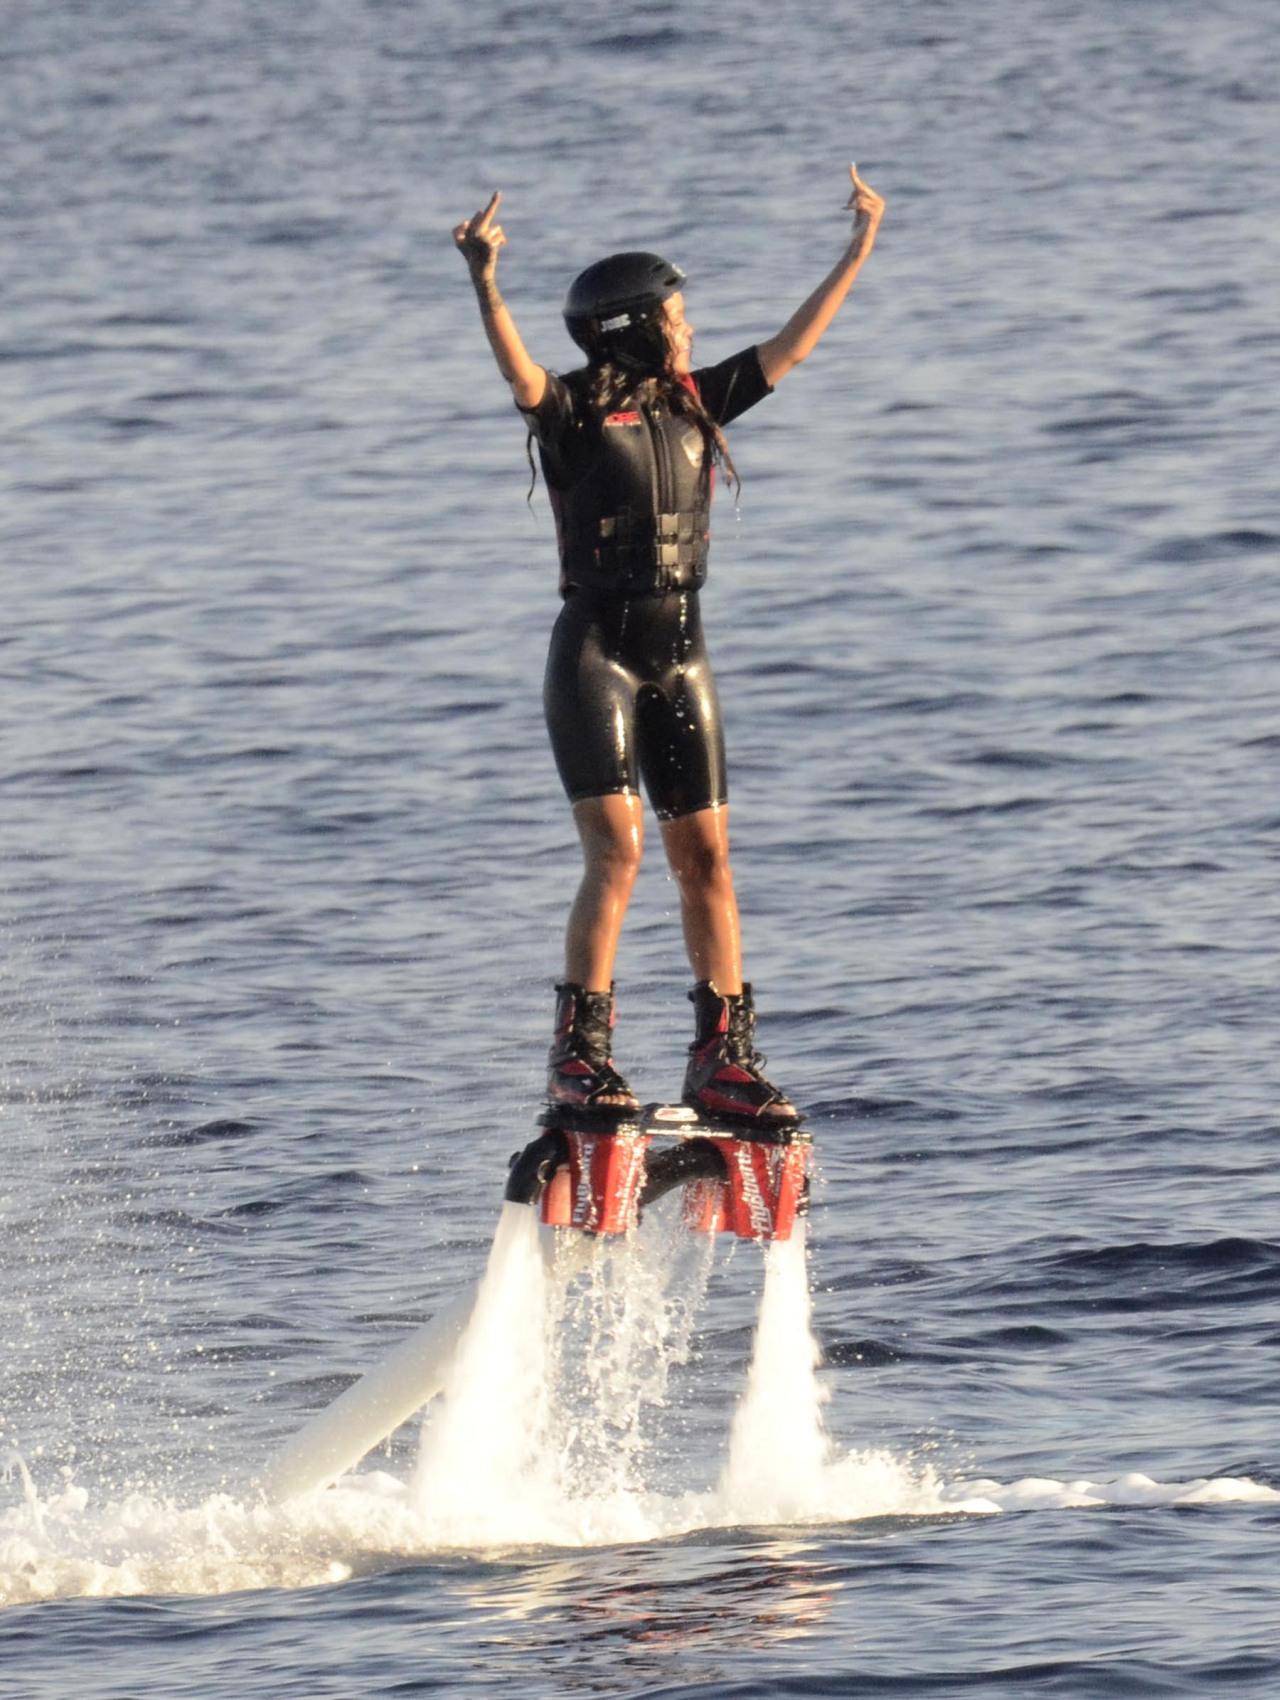 beccaoneal:  rihannainfinity:  August 30:Rihanna hydro jet surfing in Sardina, Italy  and then a herooooo comessss alooooong